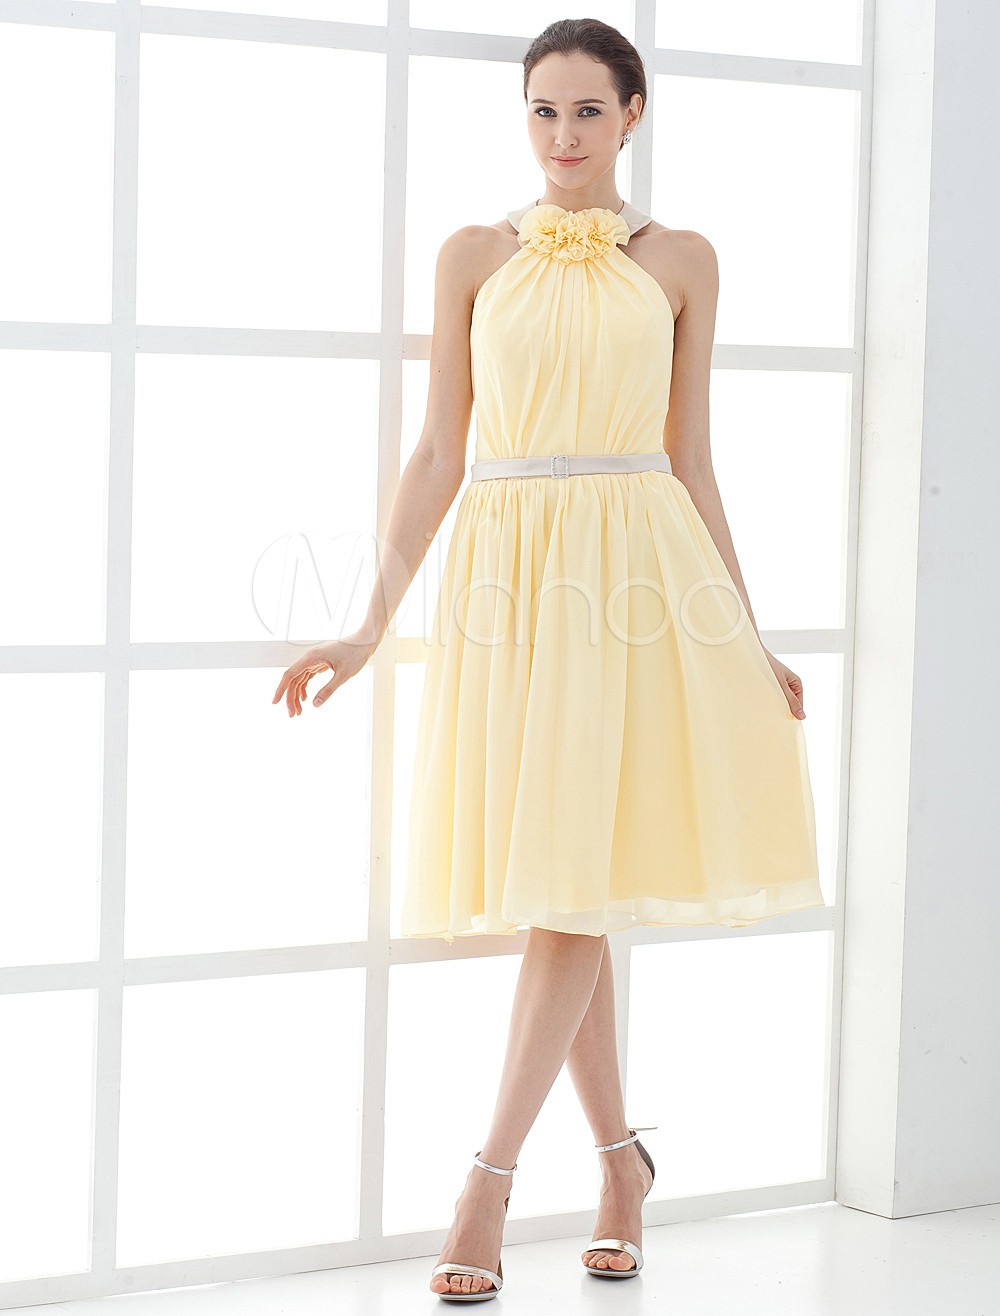 Sweet Flower Chiffon Satin Knee Length Mother of the Bride Dress